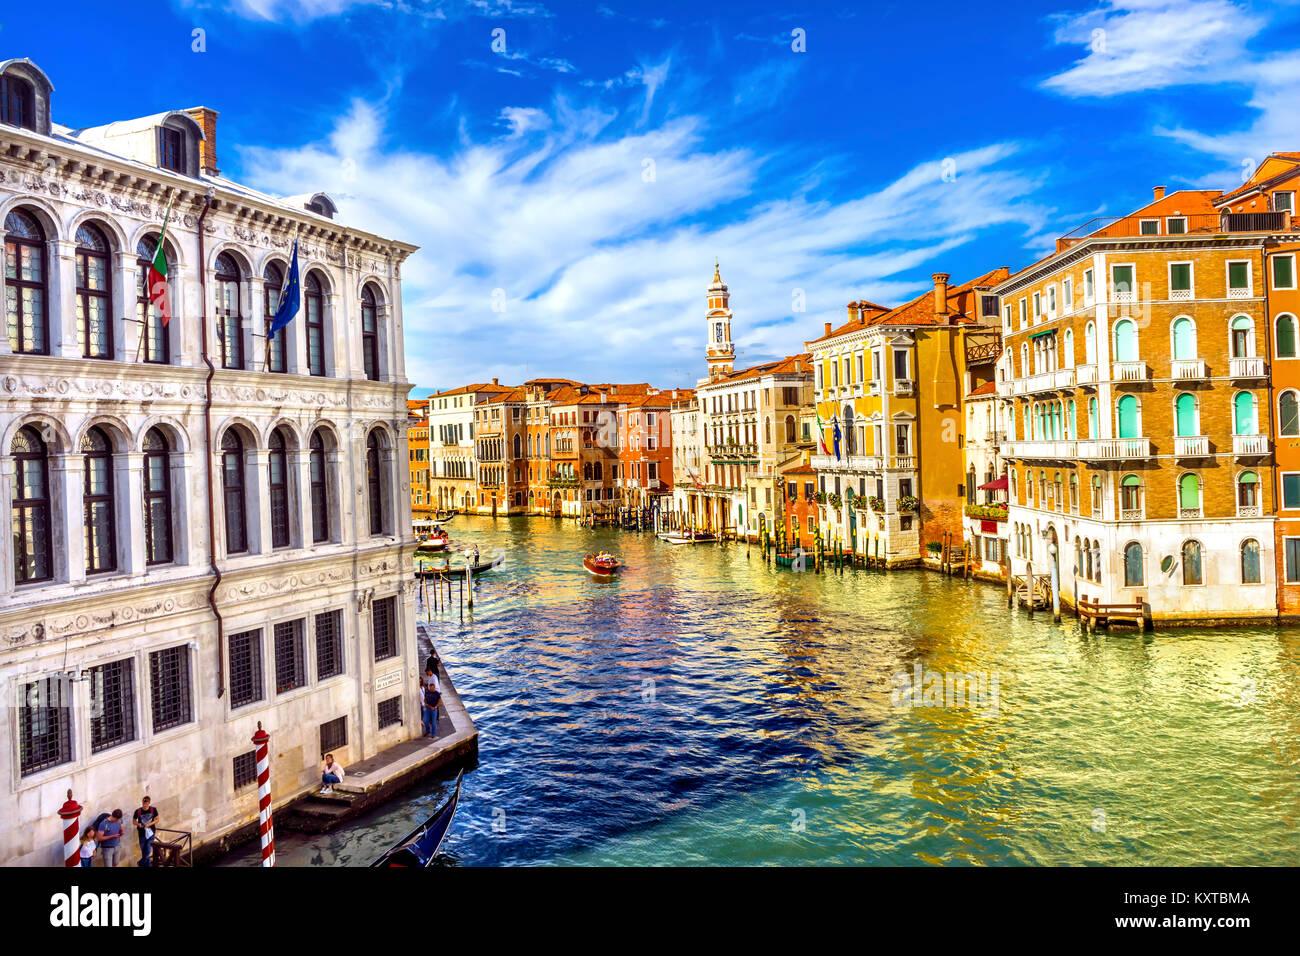 Colorful Grand Canal From Rialto Bridge Touirists Grand Canal Venice Italy Stock Photo